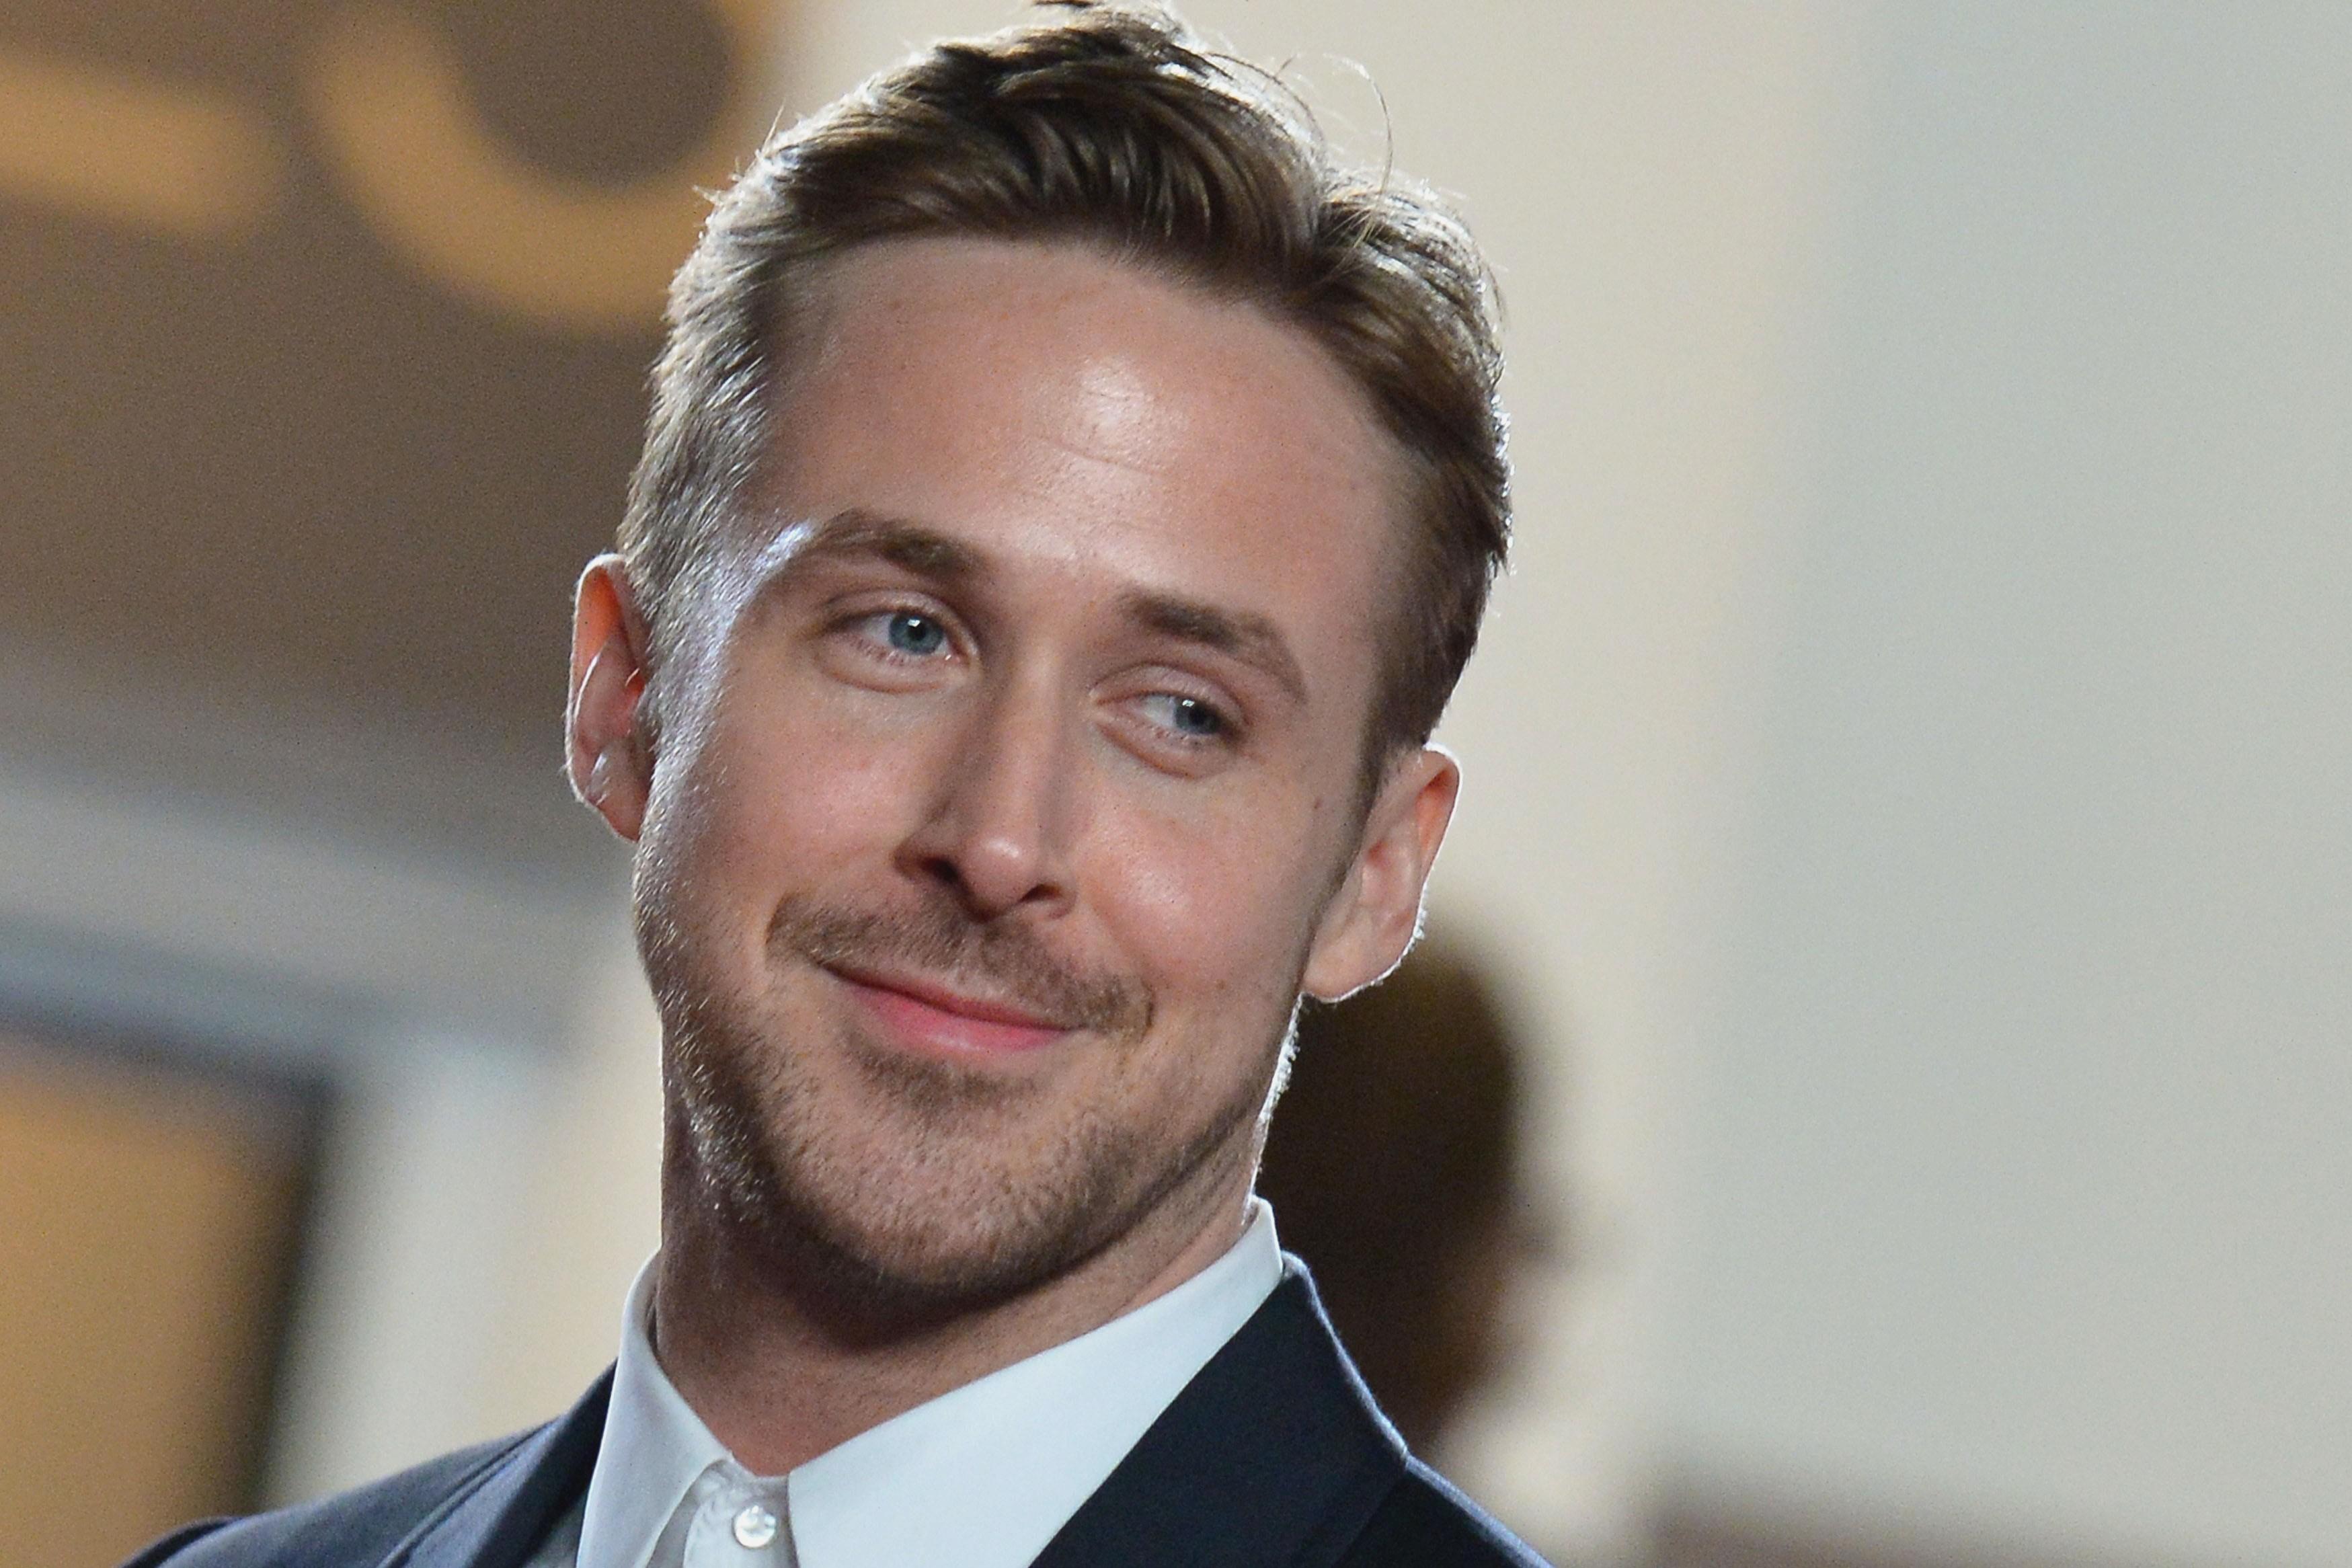 Ryan Gosling Wallpapers HD Download 3498x2332